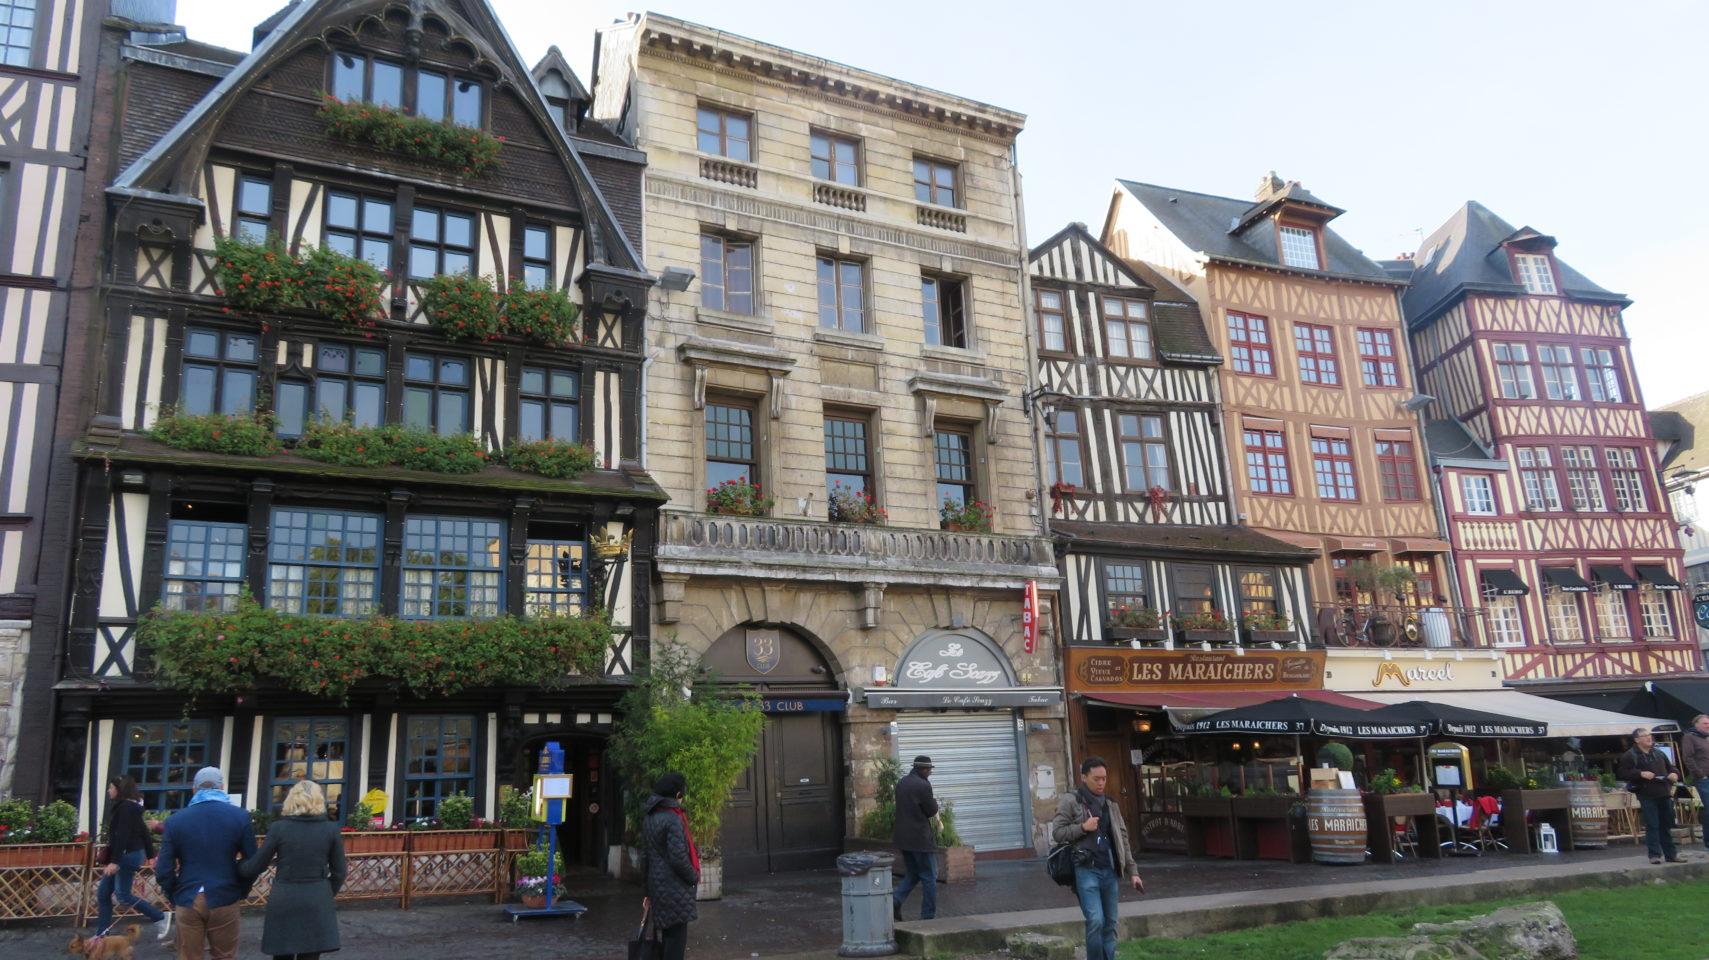 Place du Vieux Marche in Rouen, Normandie, France (Paris and Normandie AMAWaterways Cruise)